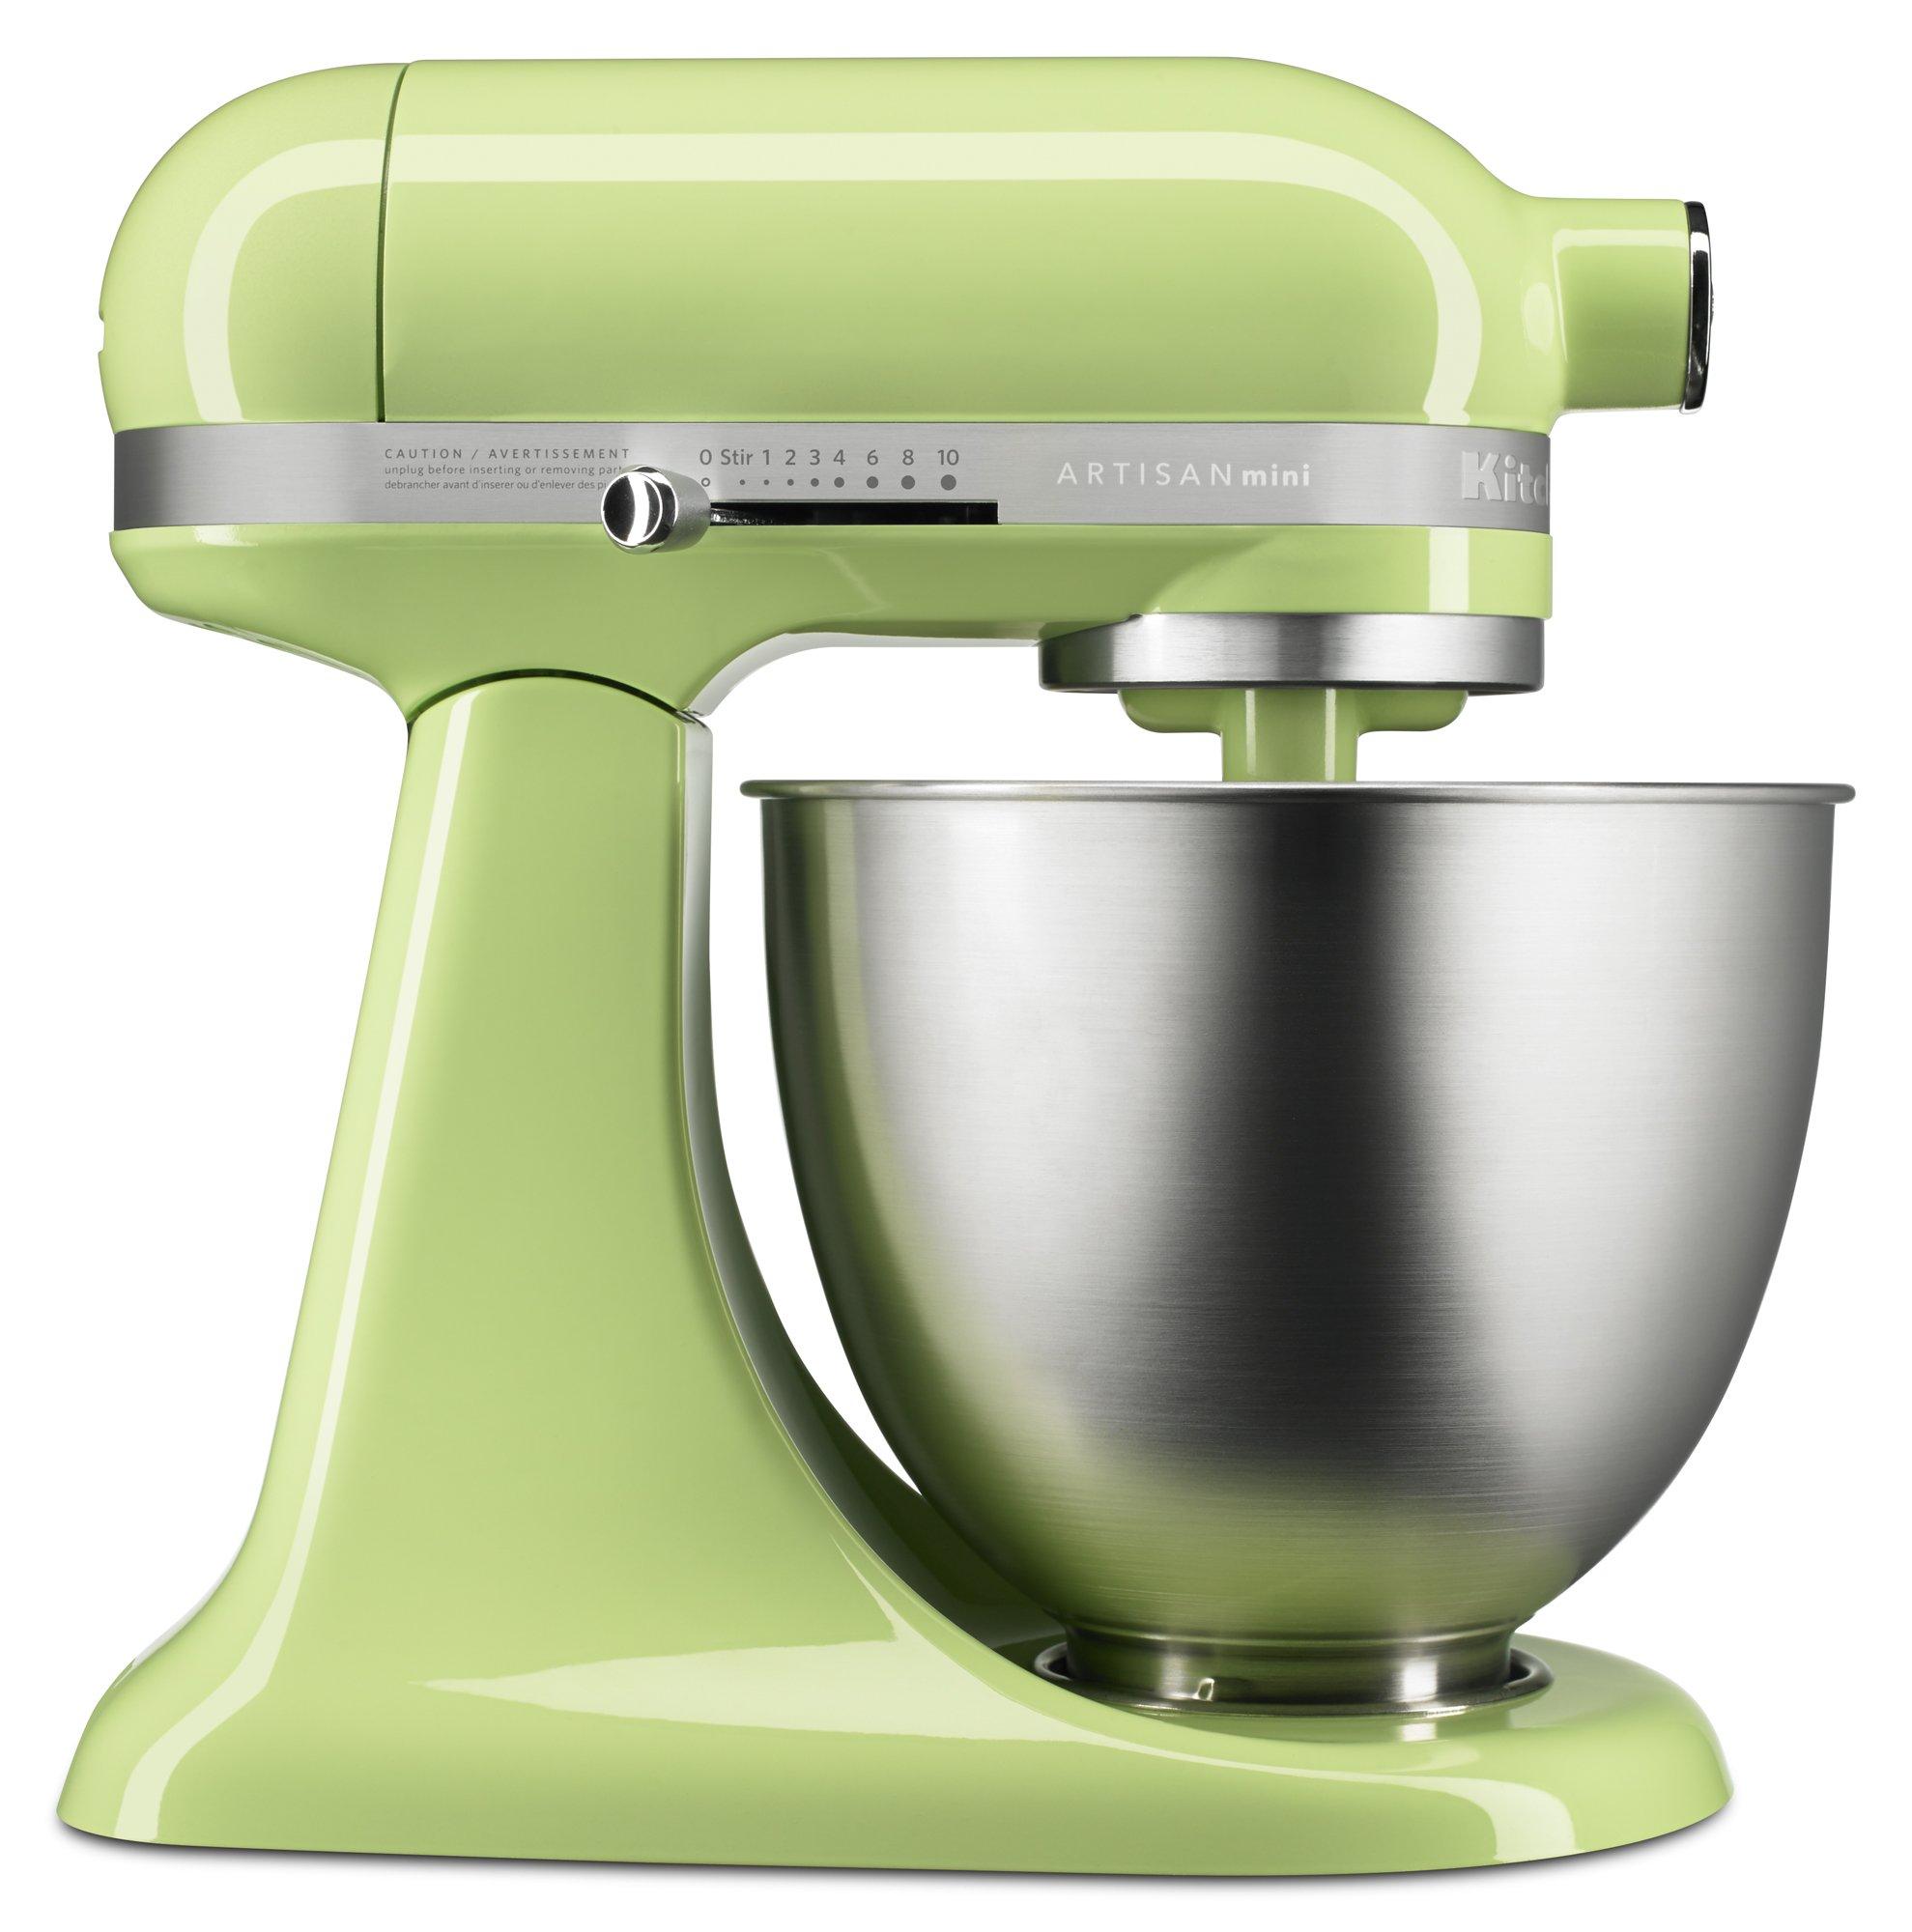 KitchenAid KSM3311XHW Artisan Mini Series Tilt-Head Stand Mixer, 3.5 quart, Honeydew